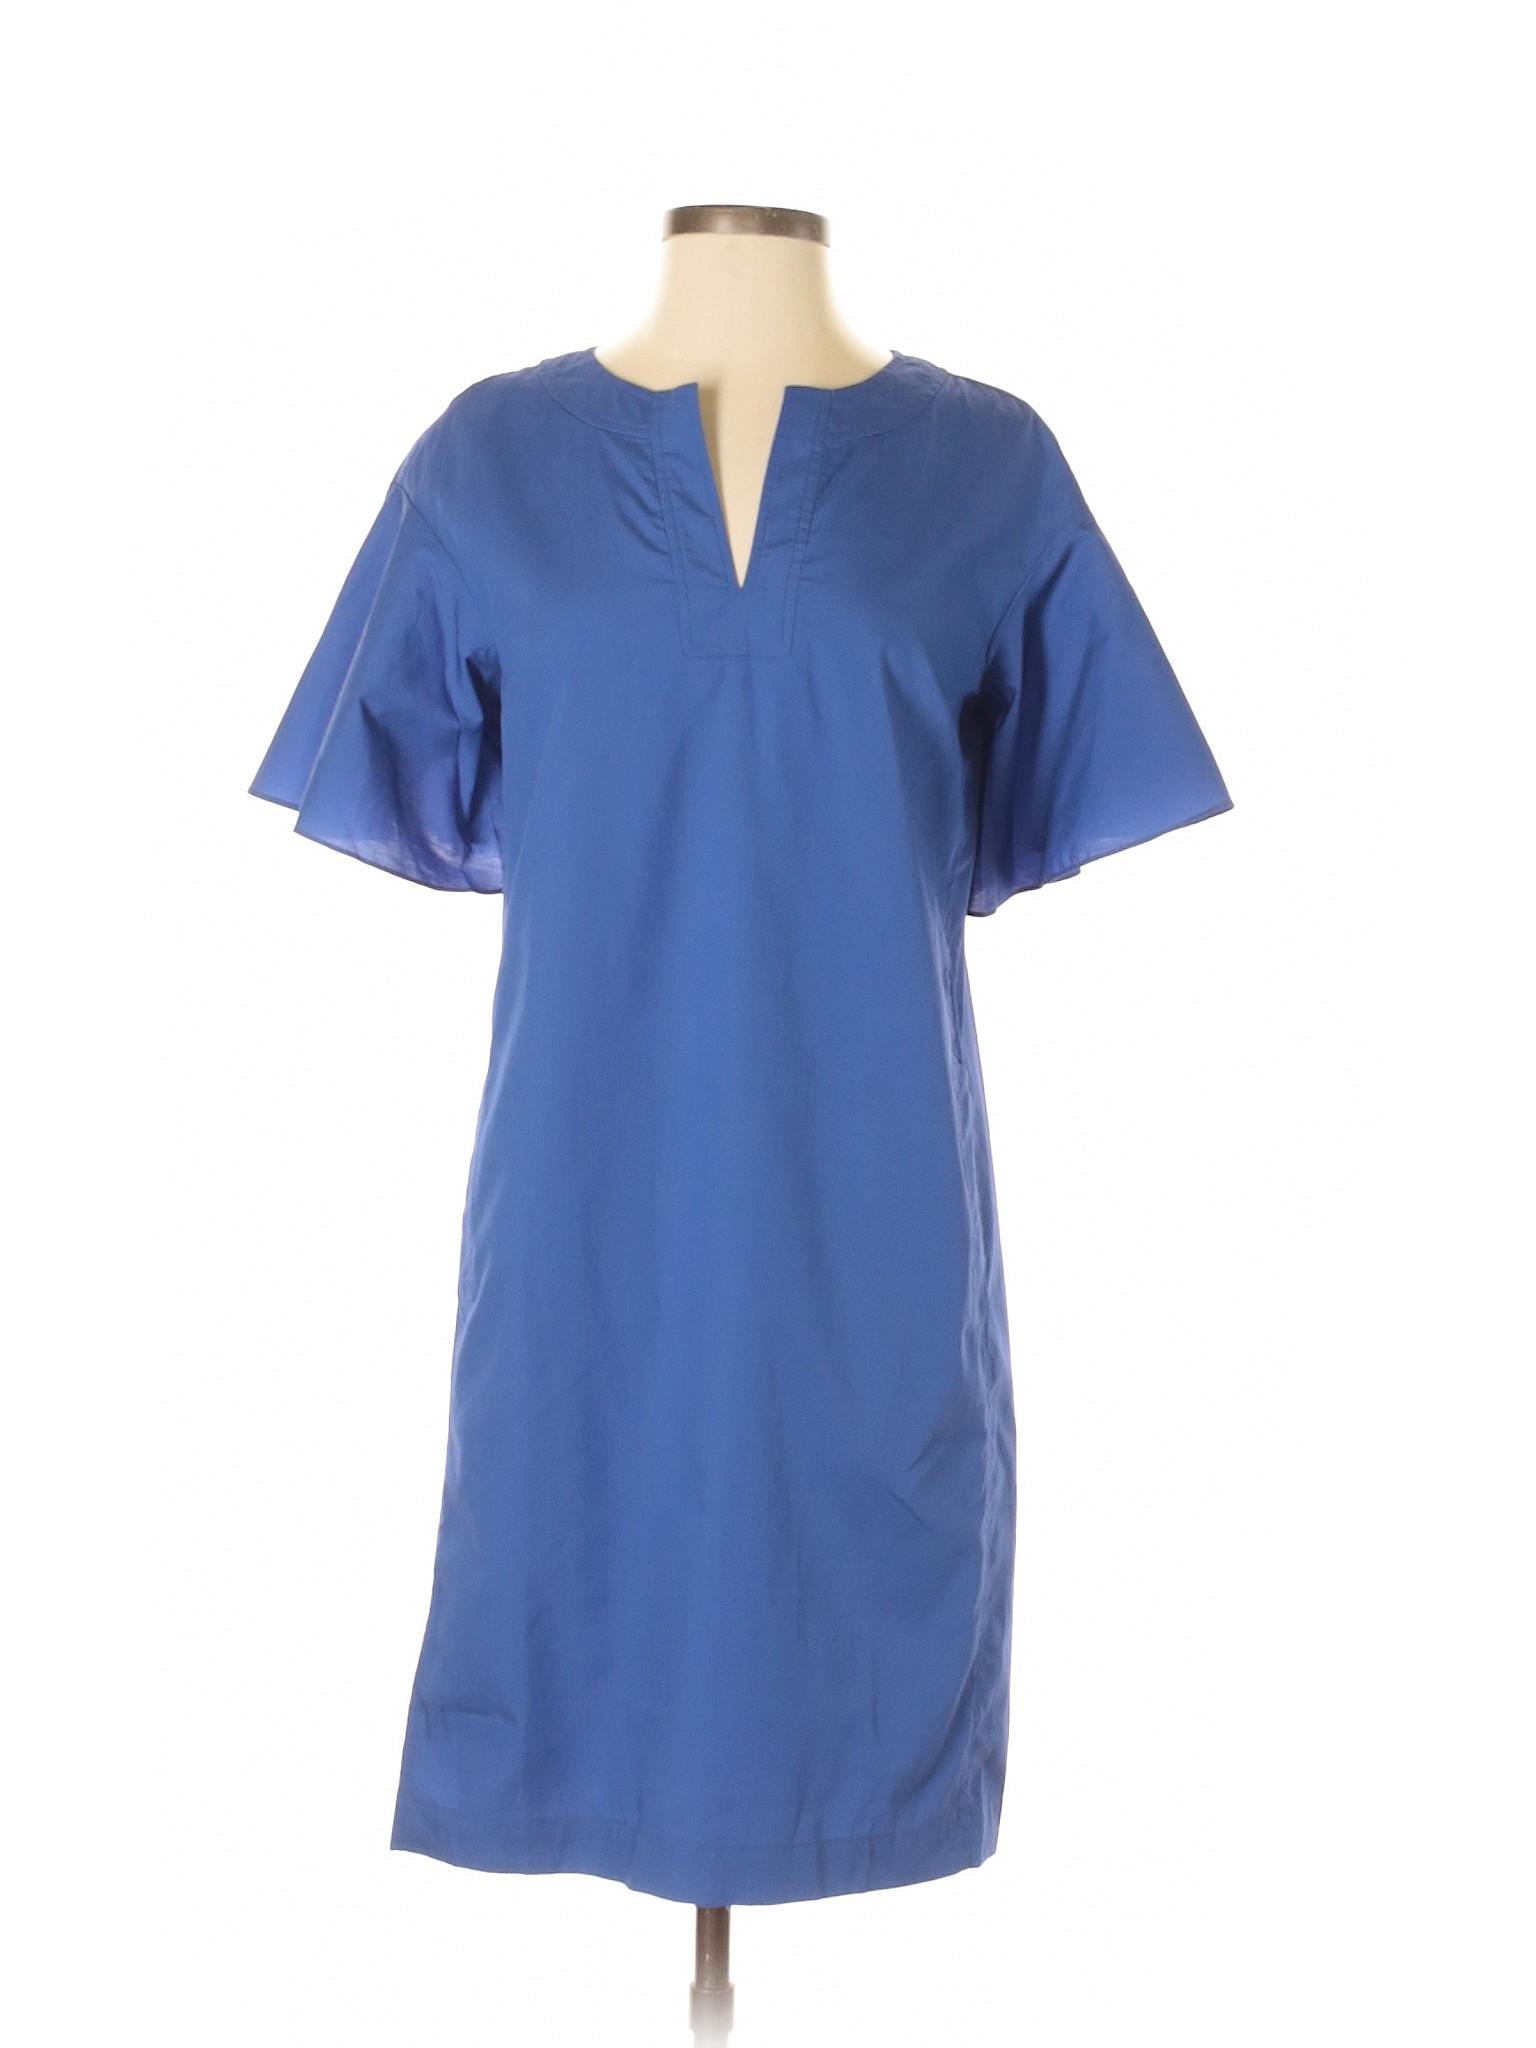 Lark amp; Dress Selling Casual Ro BdIxwx5q6